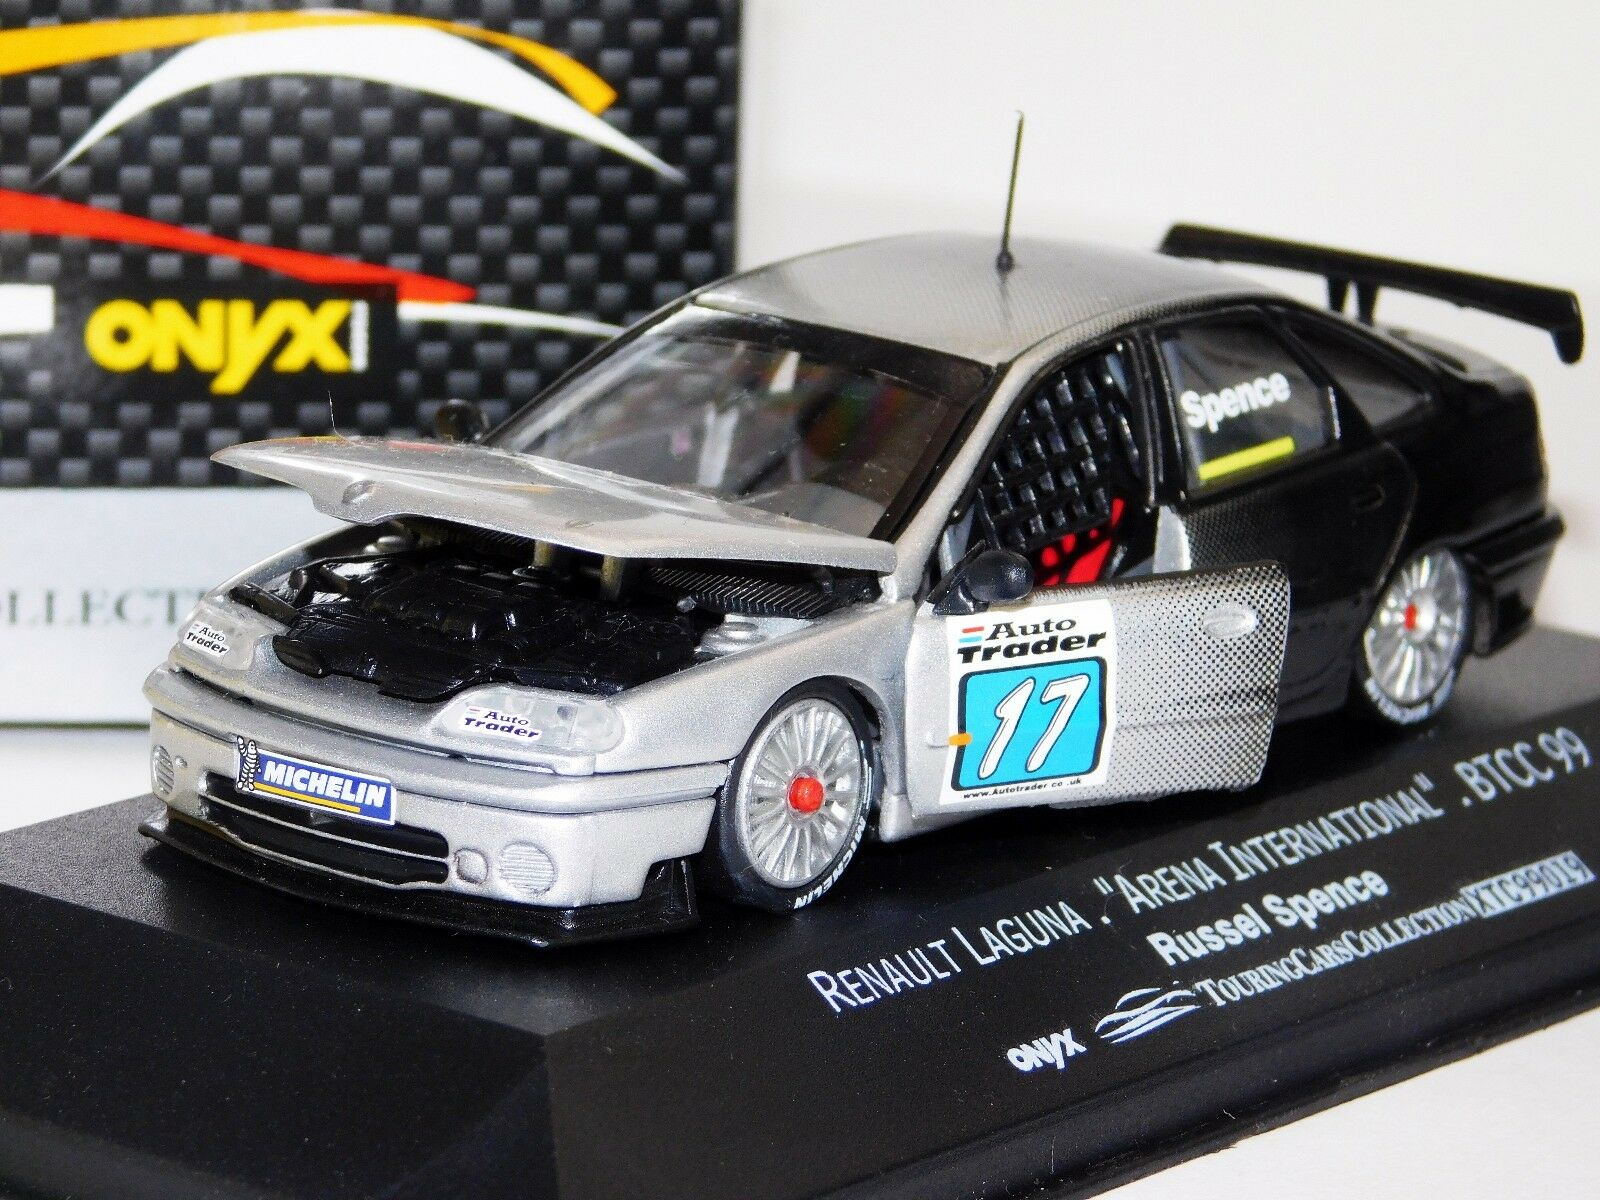 Renault Laguna Arena Russel Spence BTCC 1999 apertura Onyx XTC99019 1 43